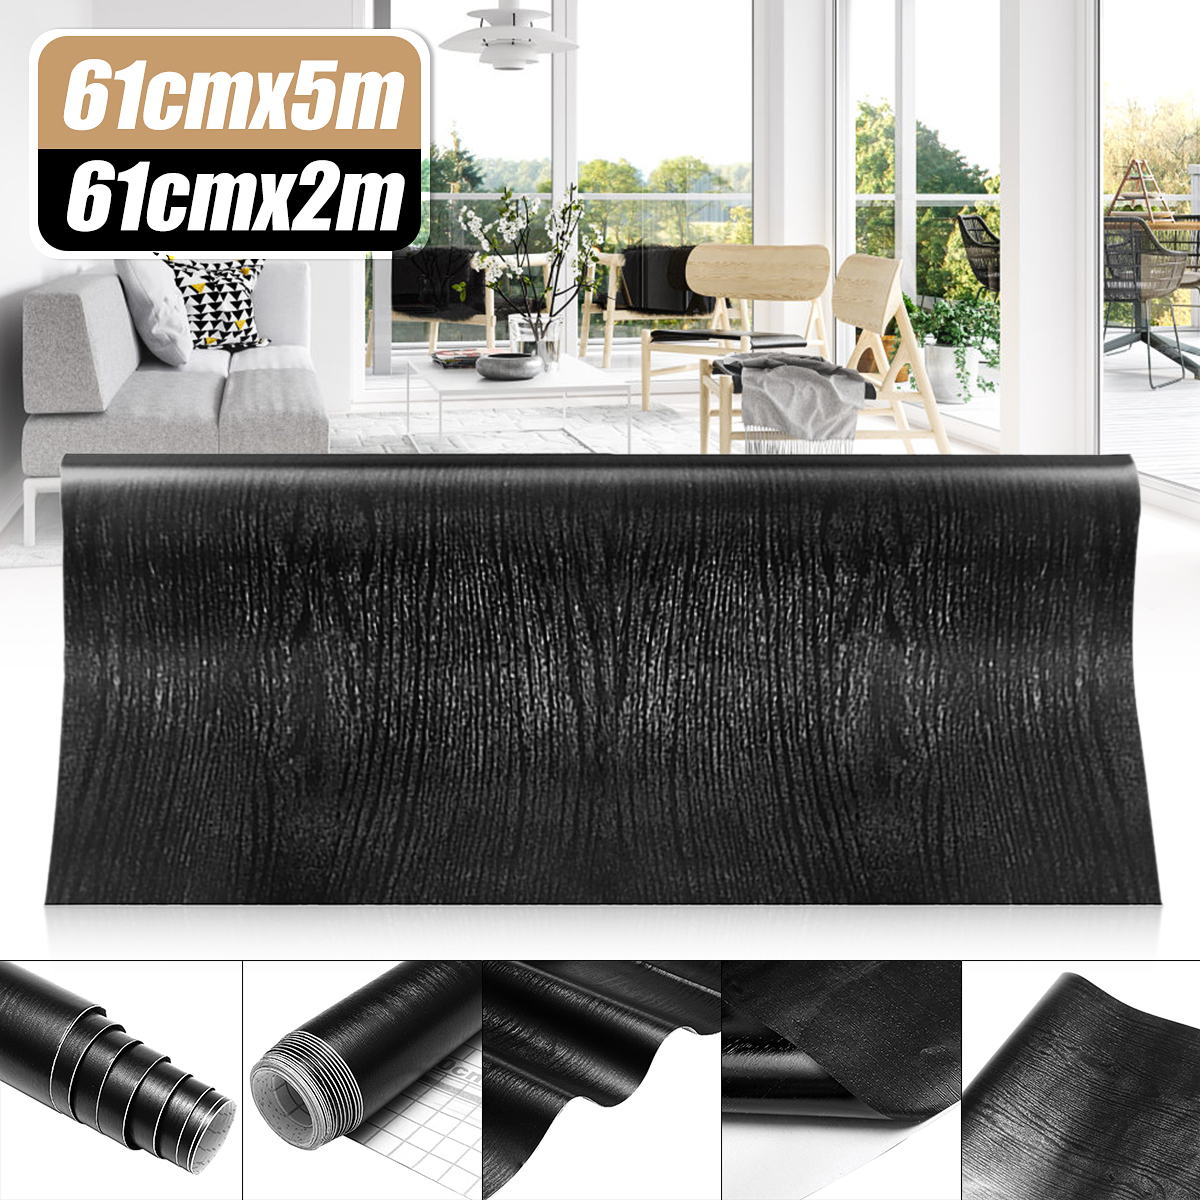 2M/5M Wood Grain Wallpaper Wall Stickers Films Refurbished Wardrobe Kitchen Clothes Cupboard Door Desktop Furniture Home Decor